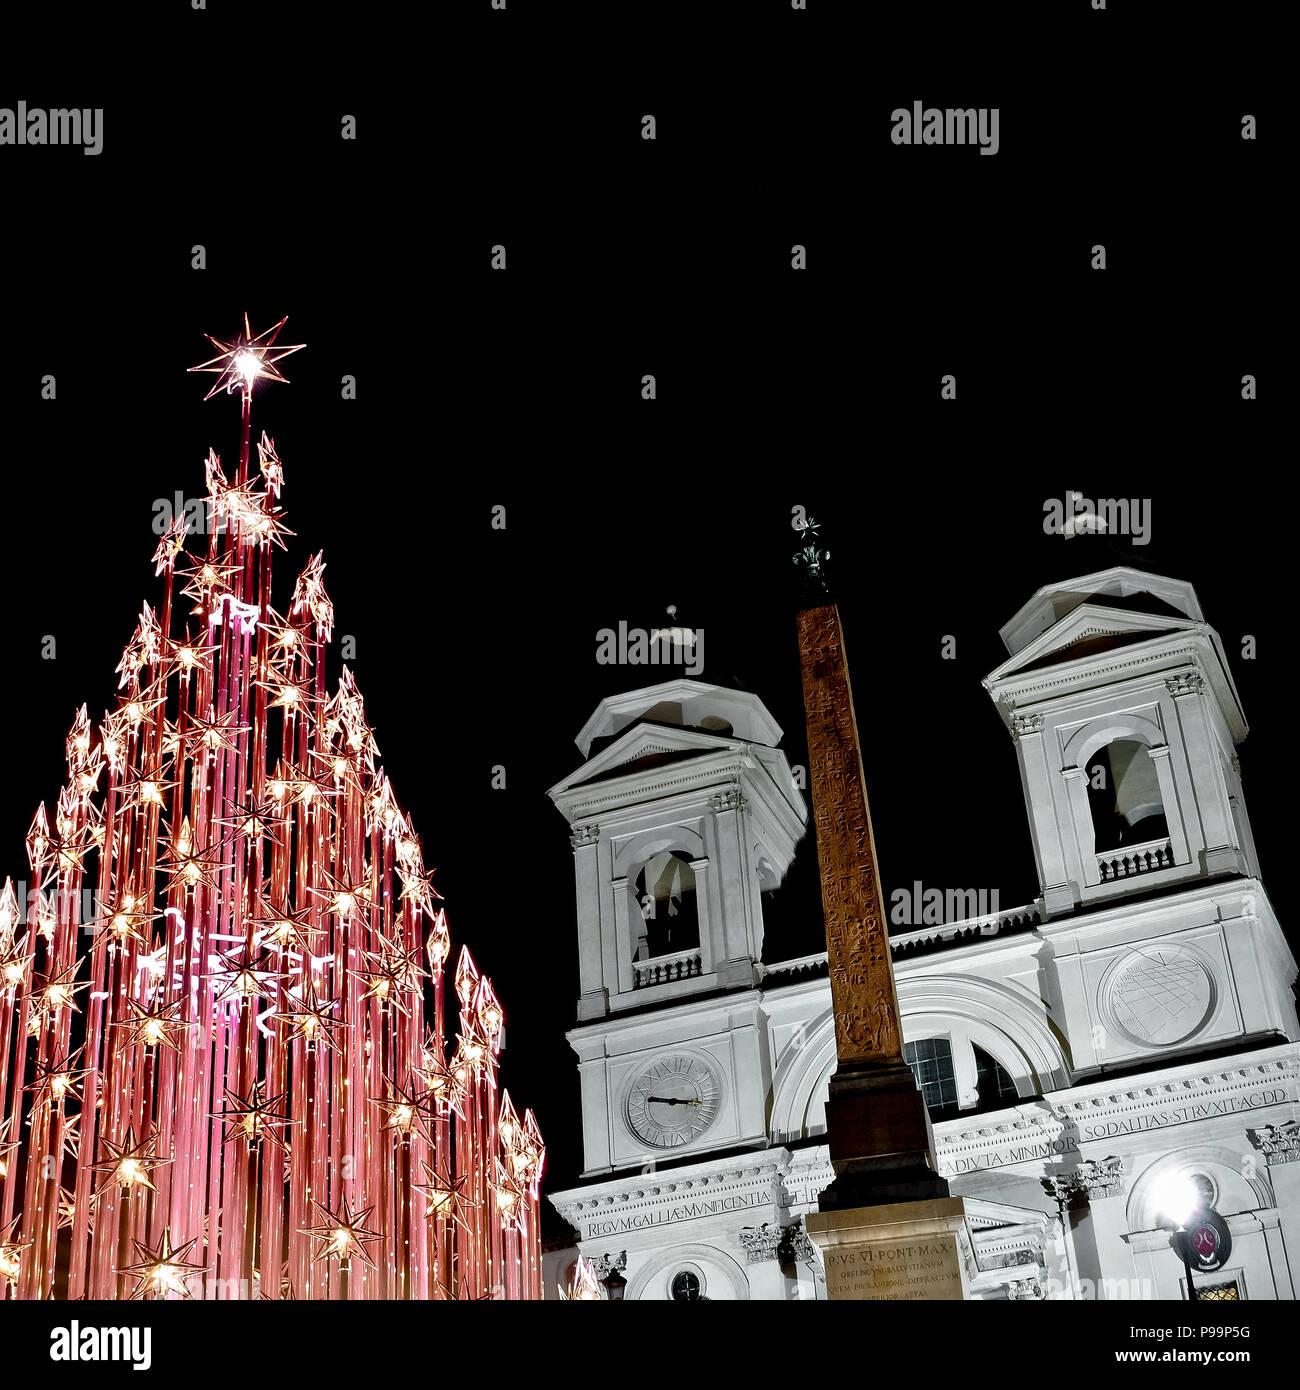 Rome Christmas led lights tree, at the Spanish Steps, Trinità dei Monti, Piazza di Spagna at night. Italy, Europe. Christmastime, Xmas. - Stock Image